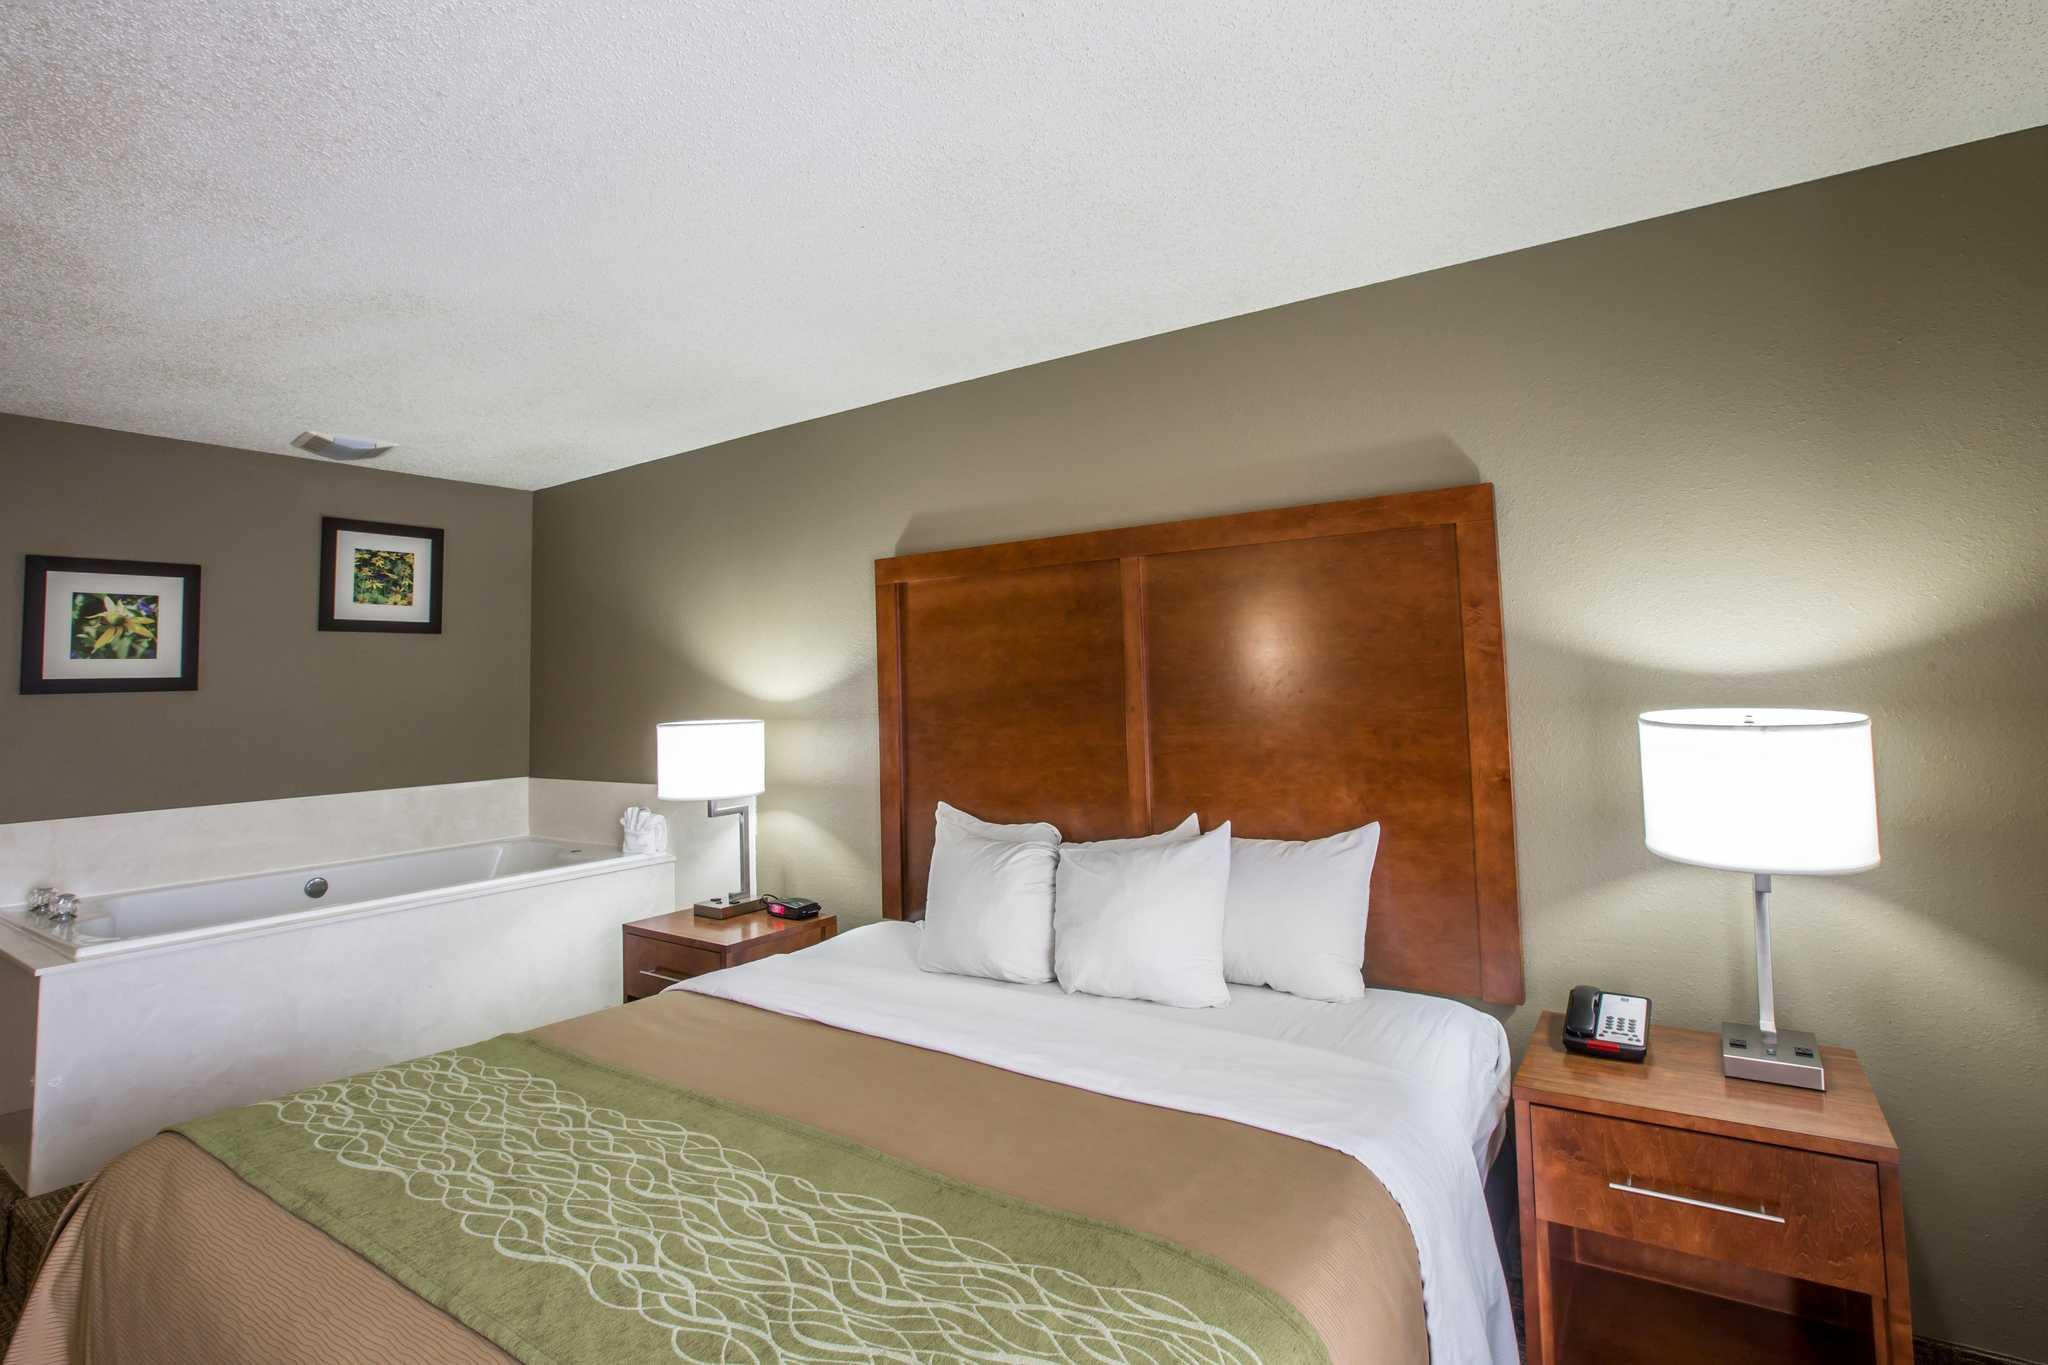 Comfort Inn & Suites at Dollywood Lane image 25